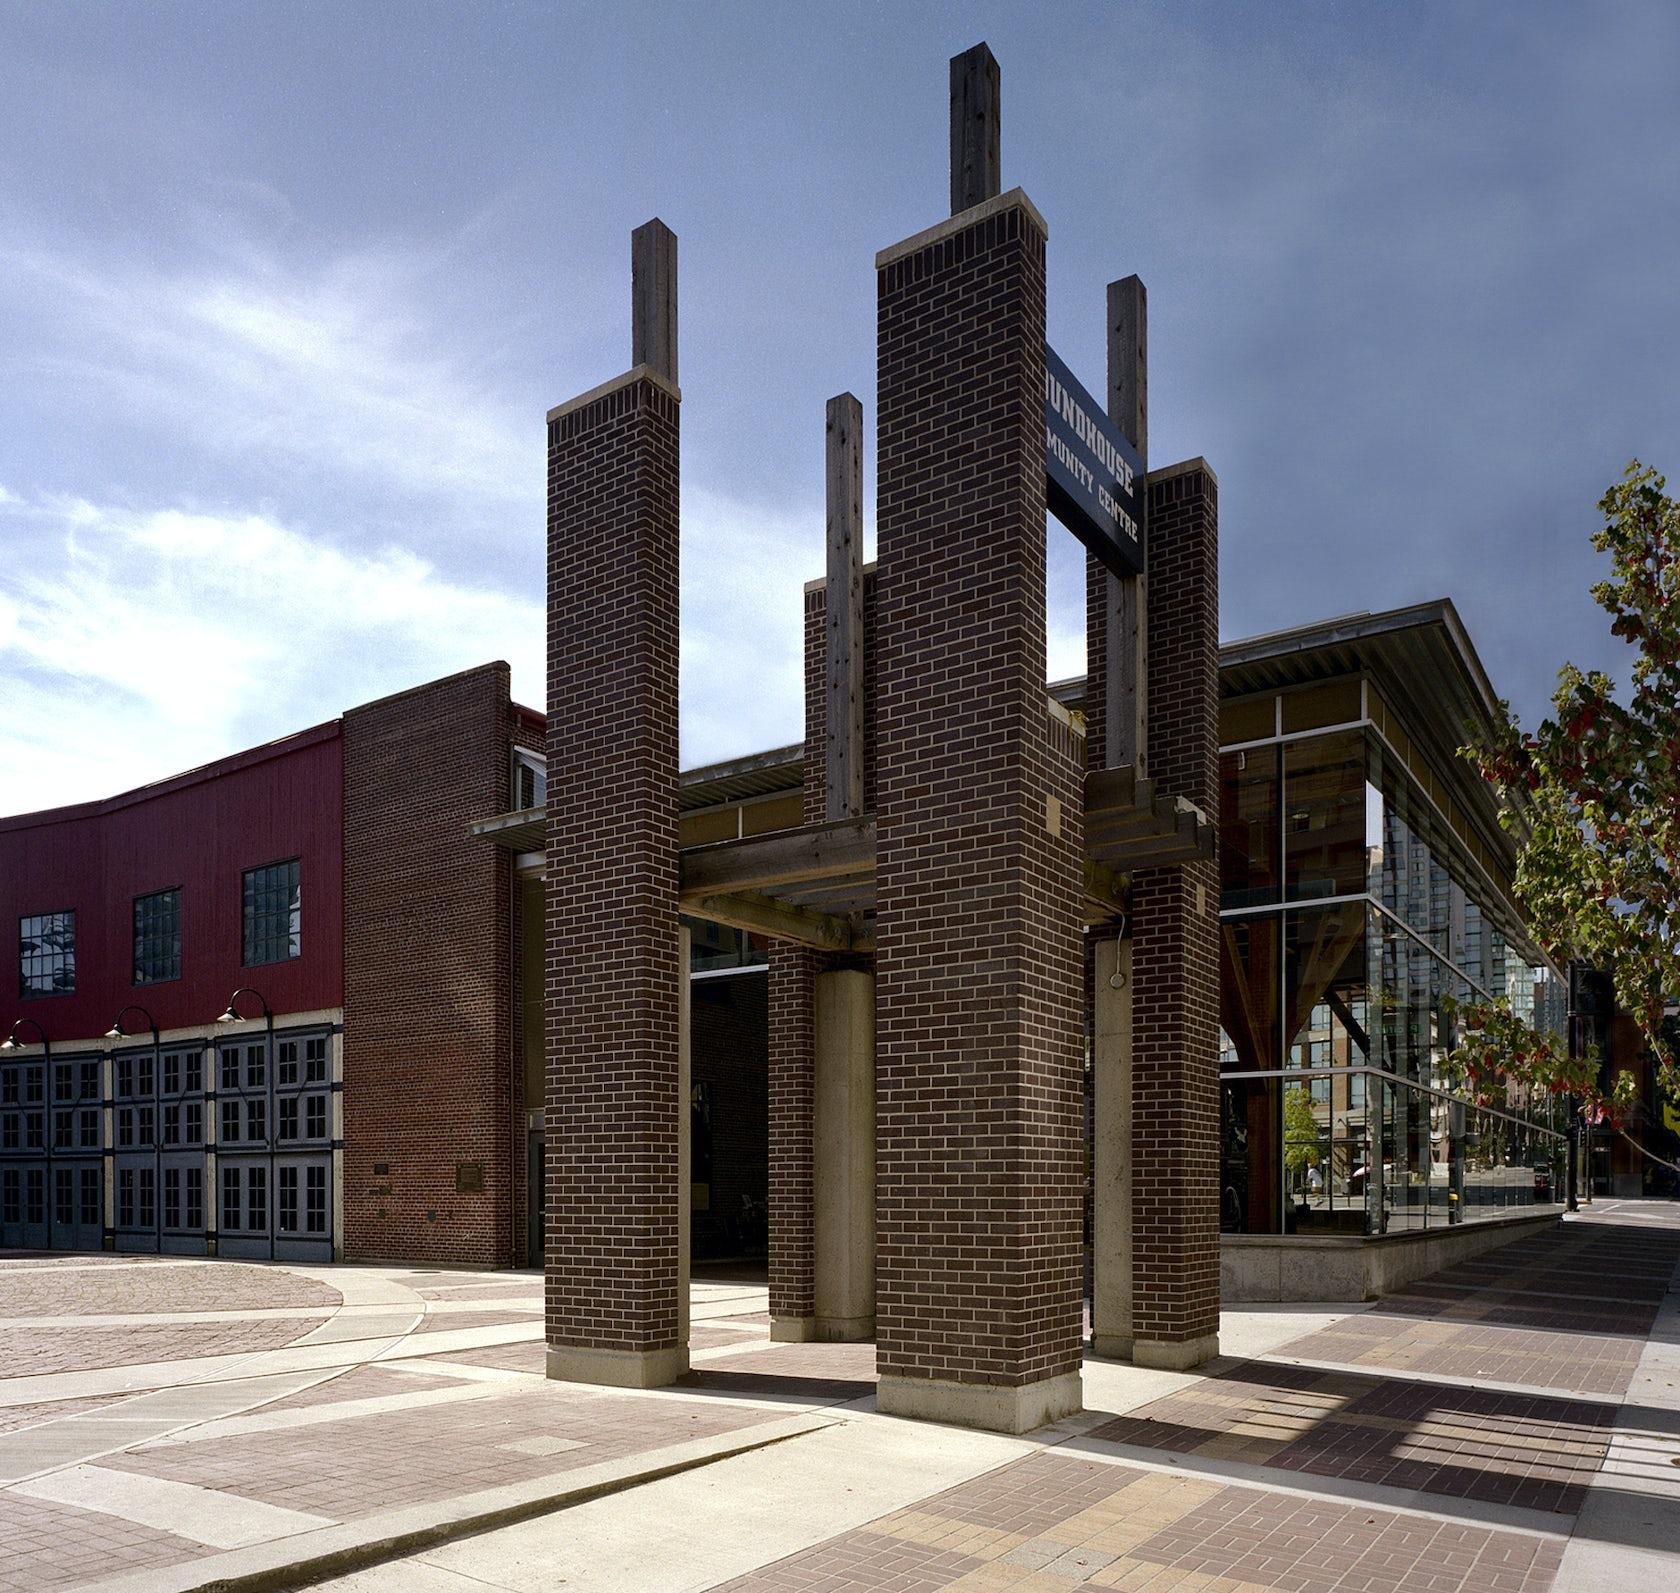 Roundhouse Community Centre on Architizer